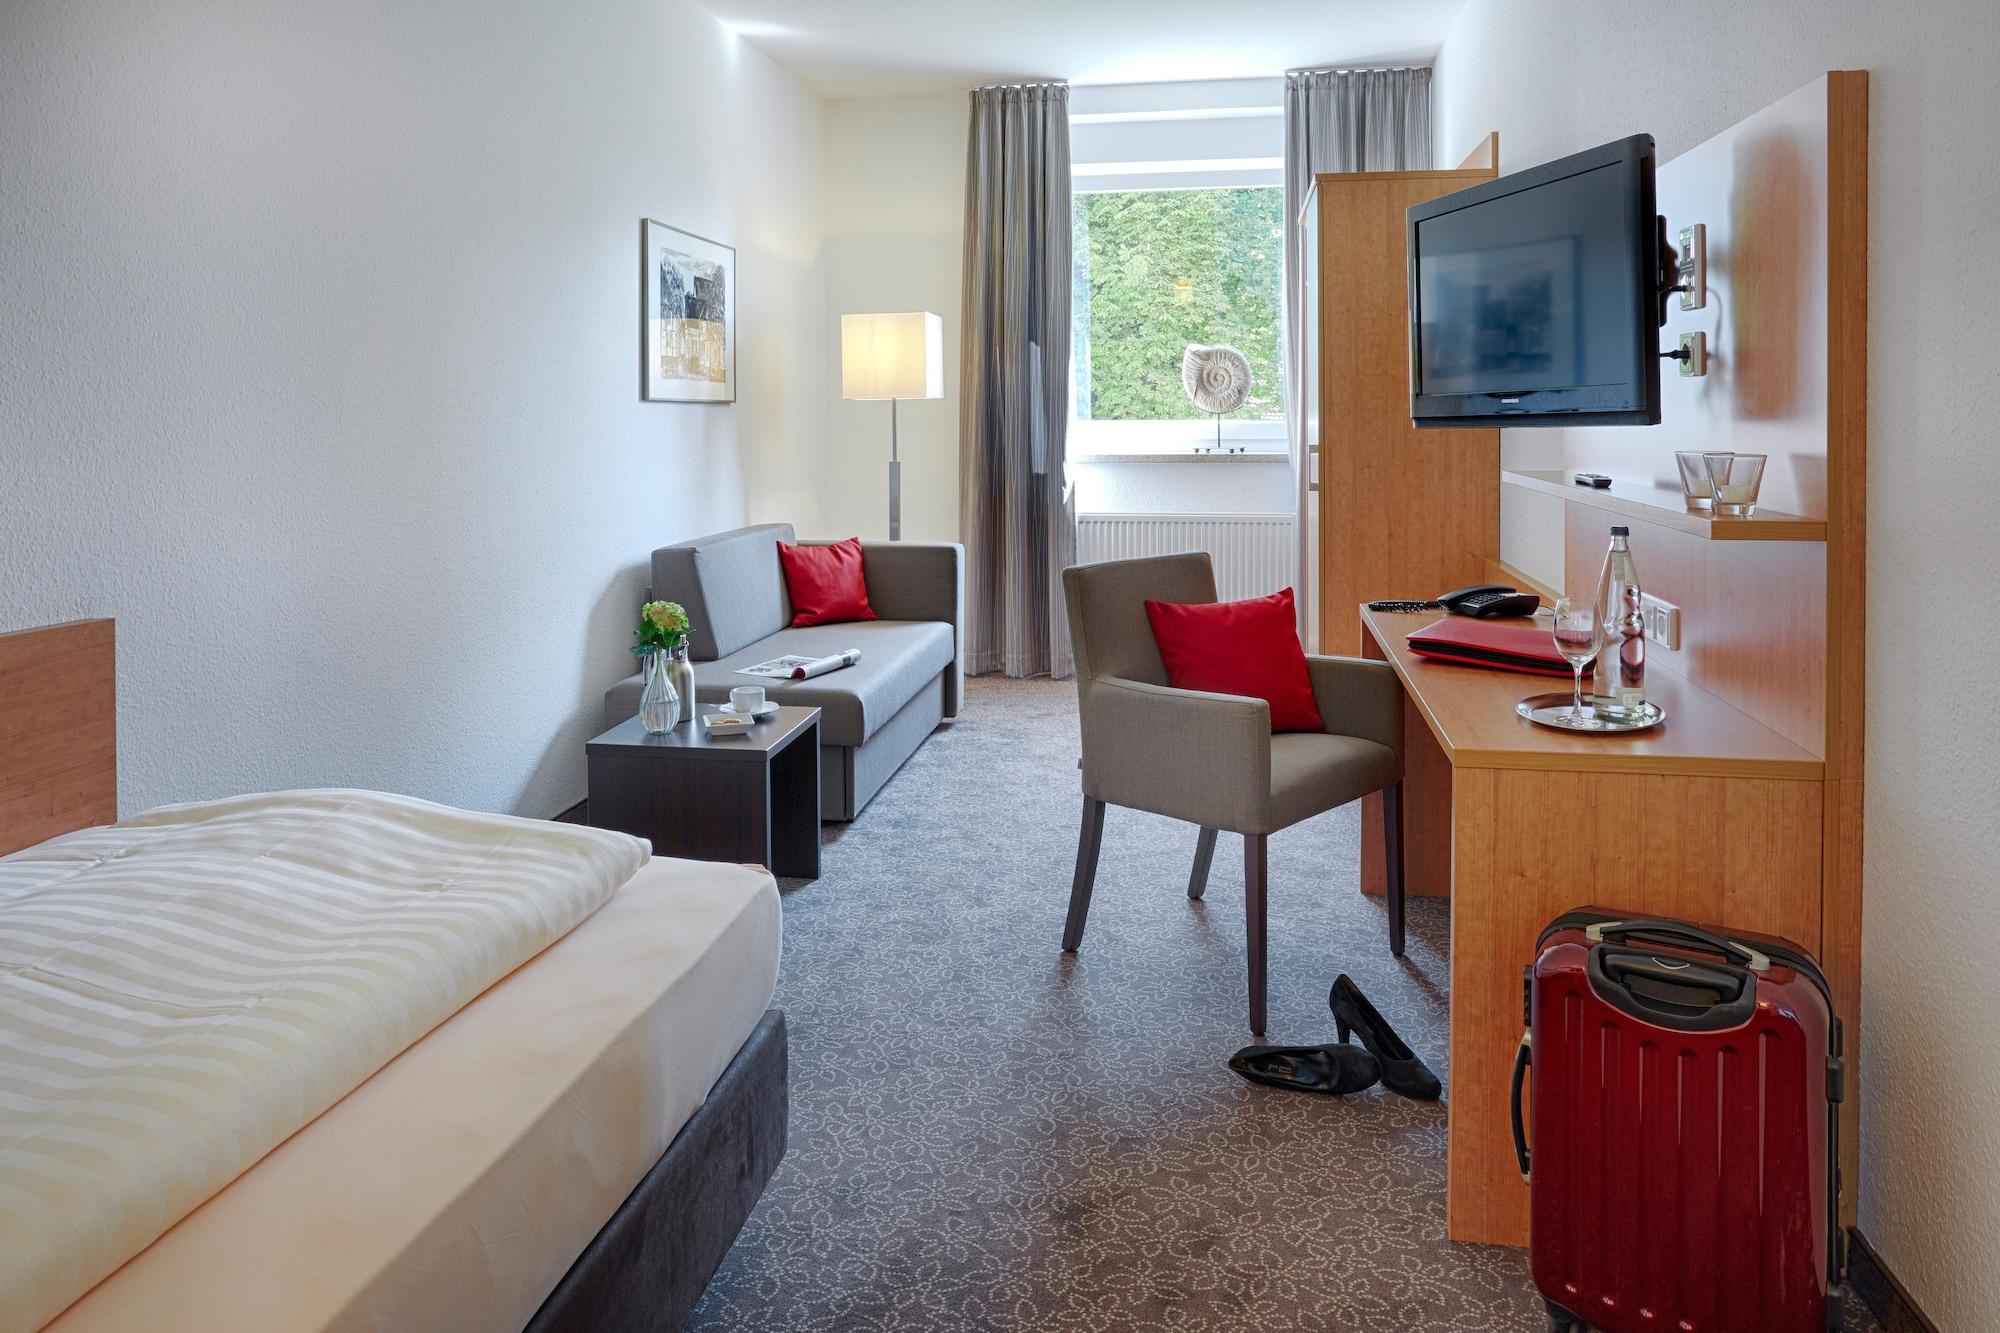 BSW - Hotel Villa Dürkopp, Lippe